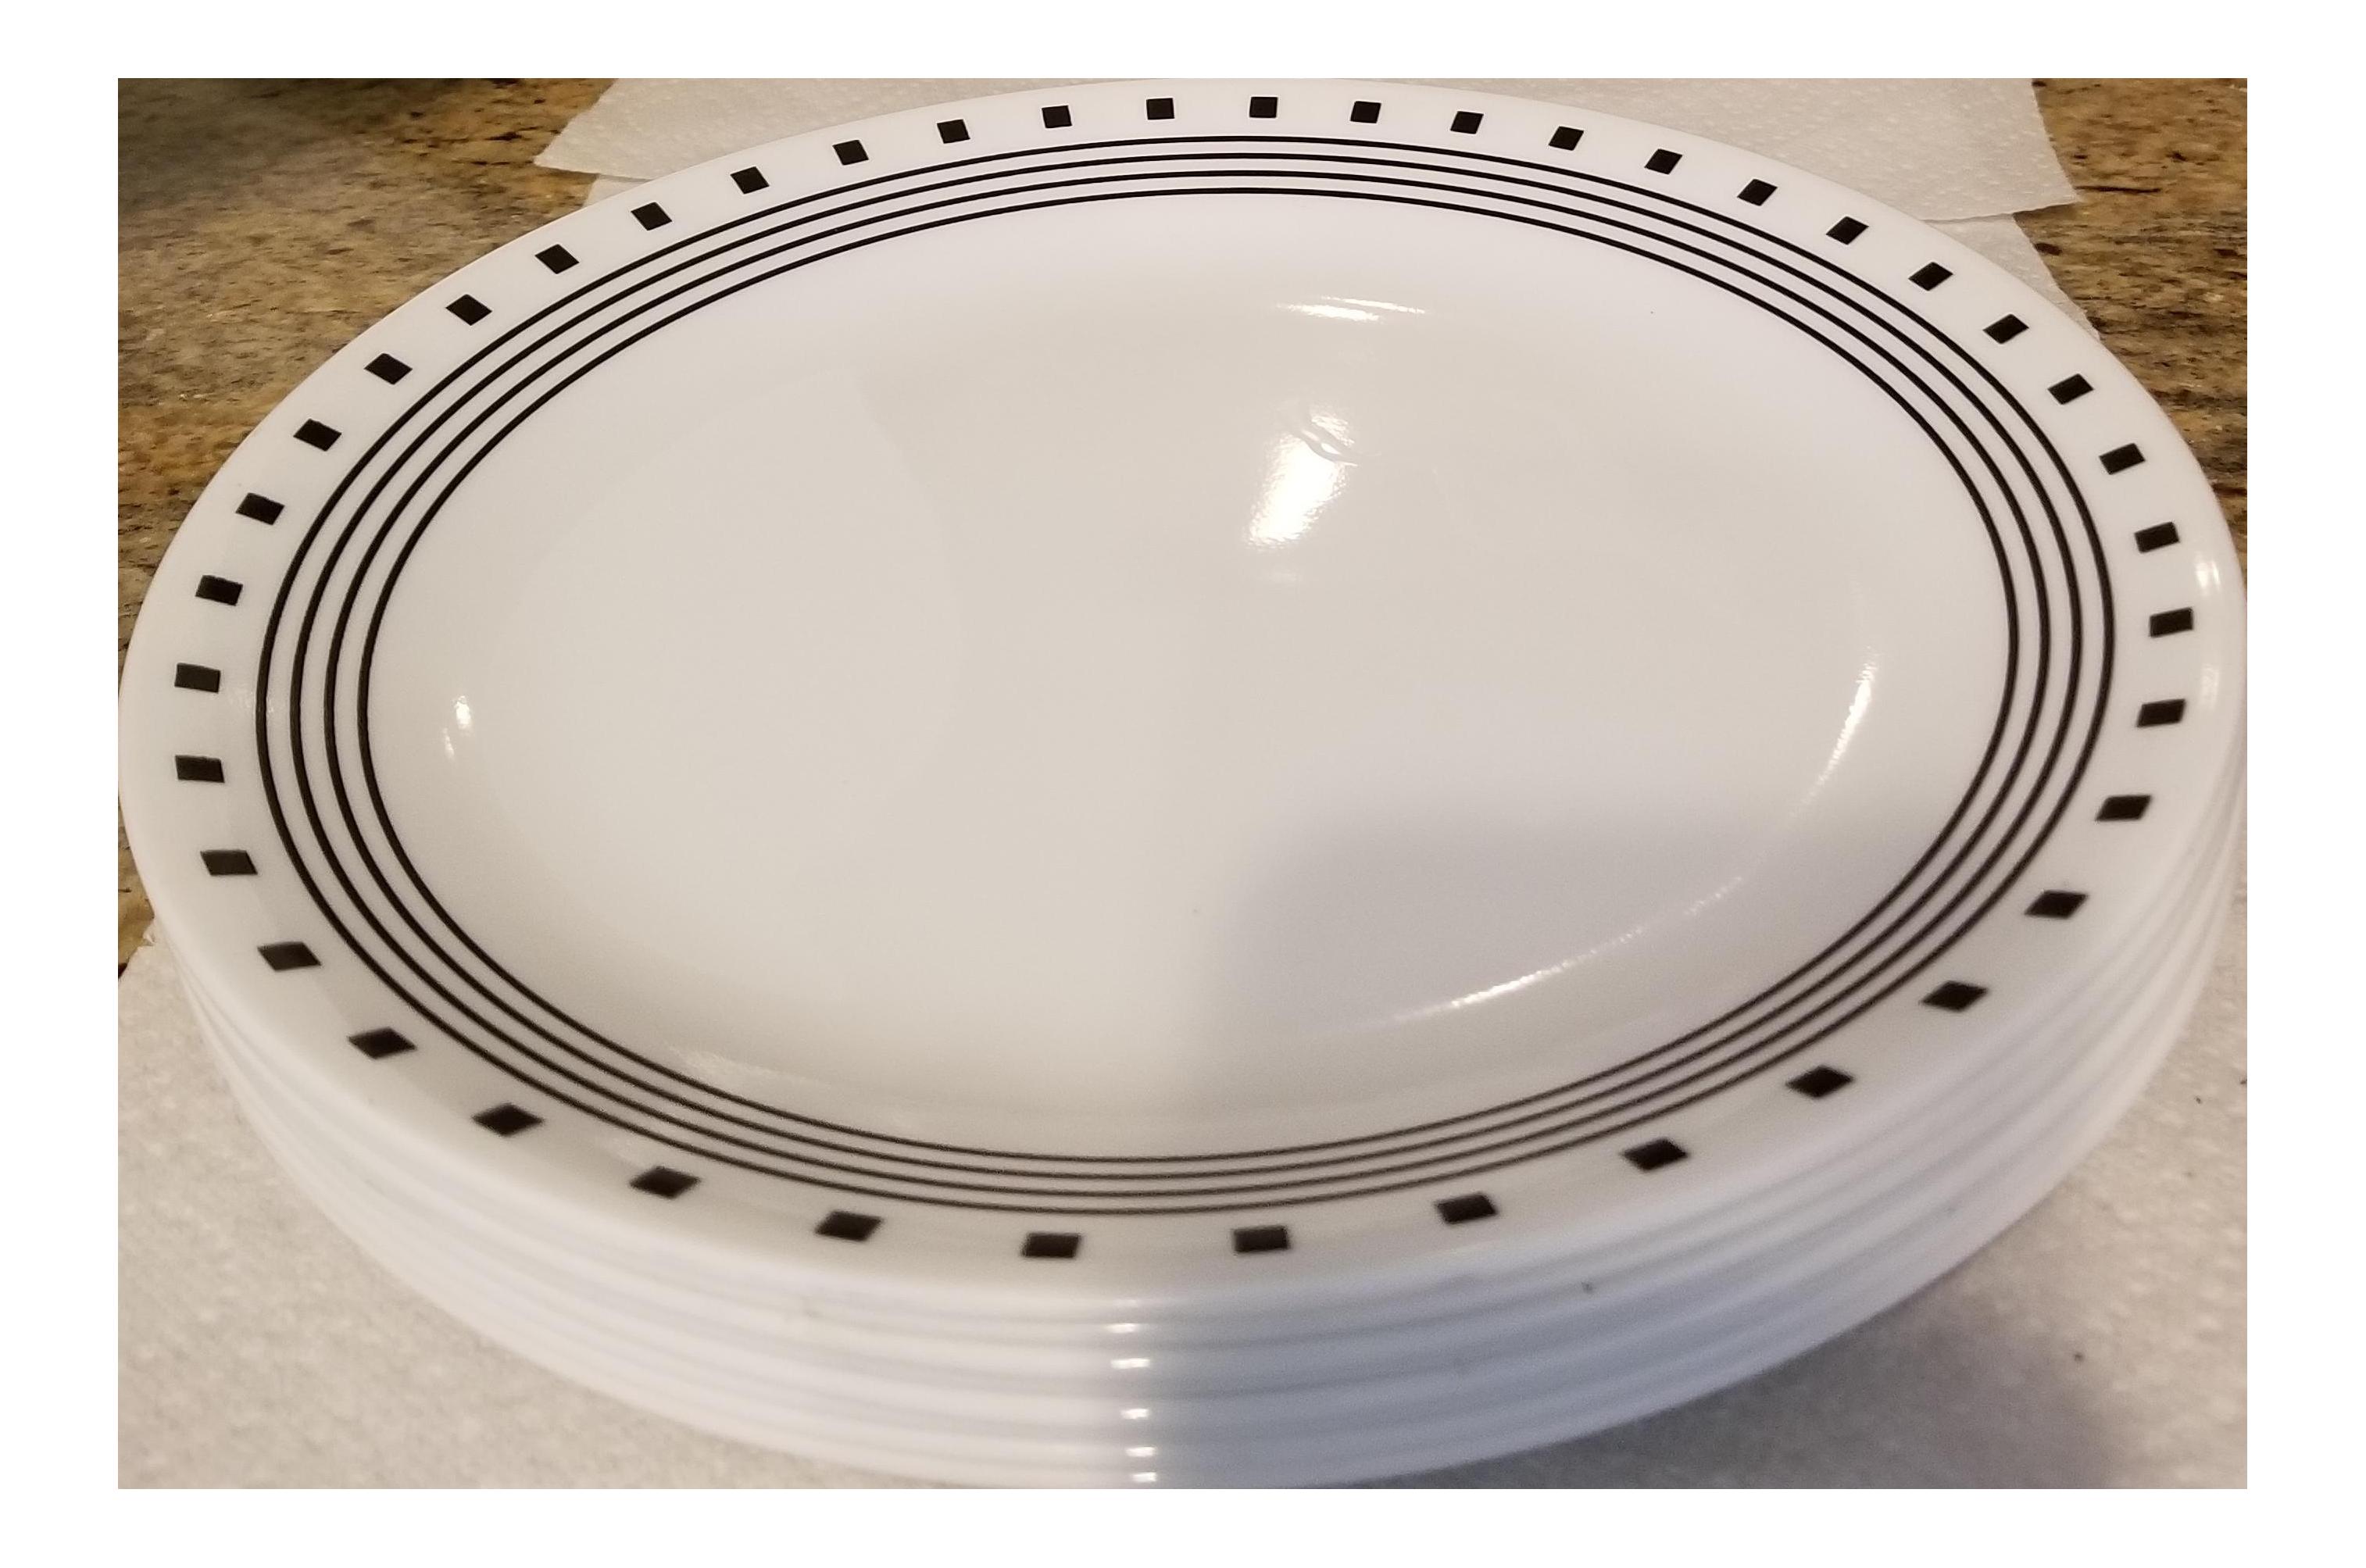 Vintage Black and White Corelle Large Dinner Plates - Set of 8 - Image 1 of  sc 1 st  Chairish & Vintage Black and White Corelle Large Dinner Plates - Set of 8 ...